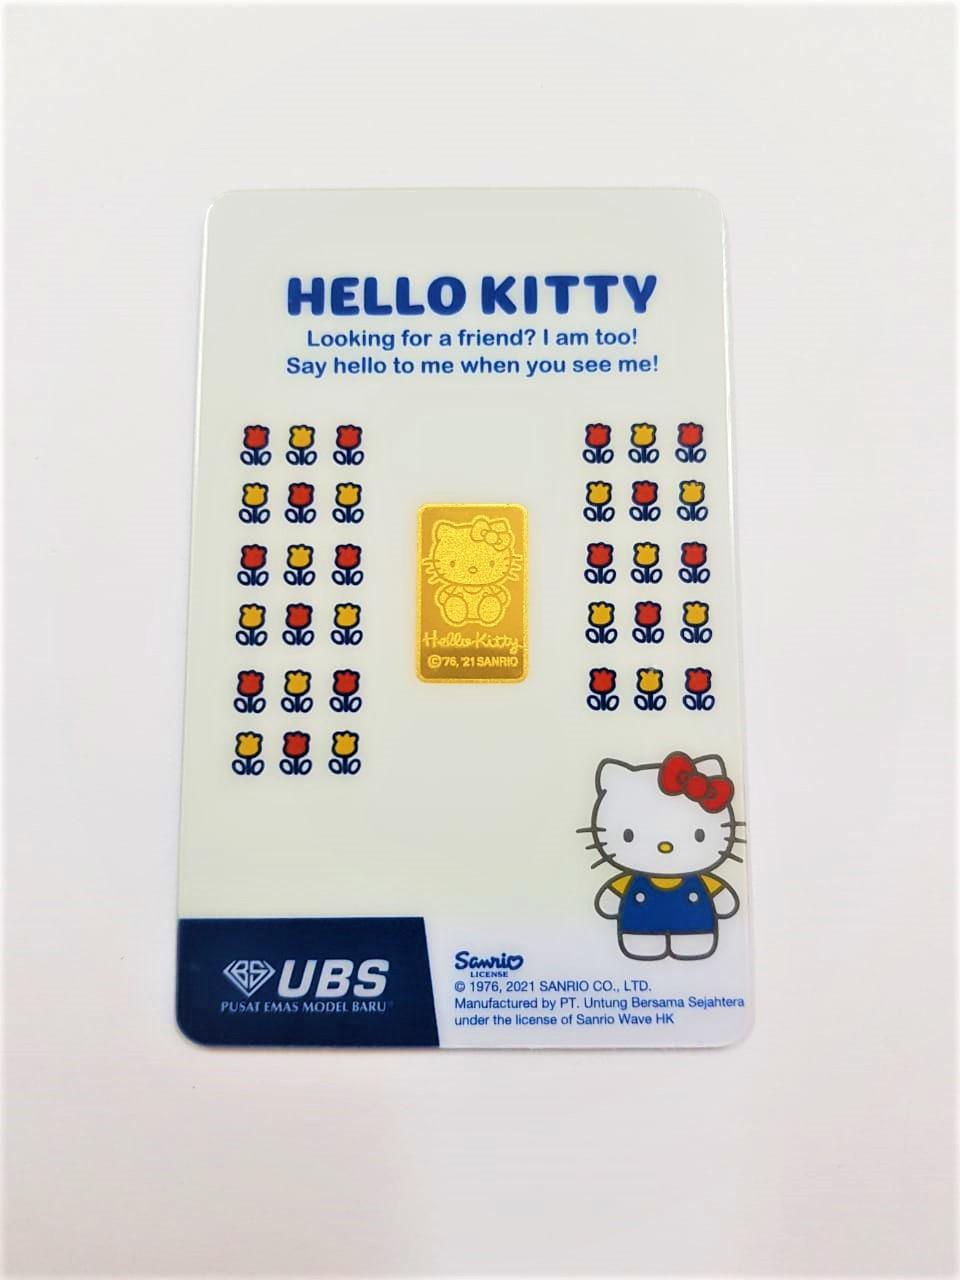 helo kitty 1